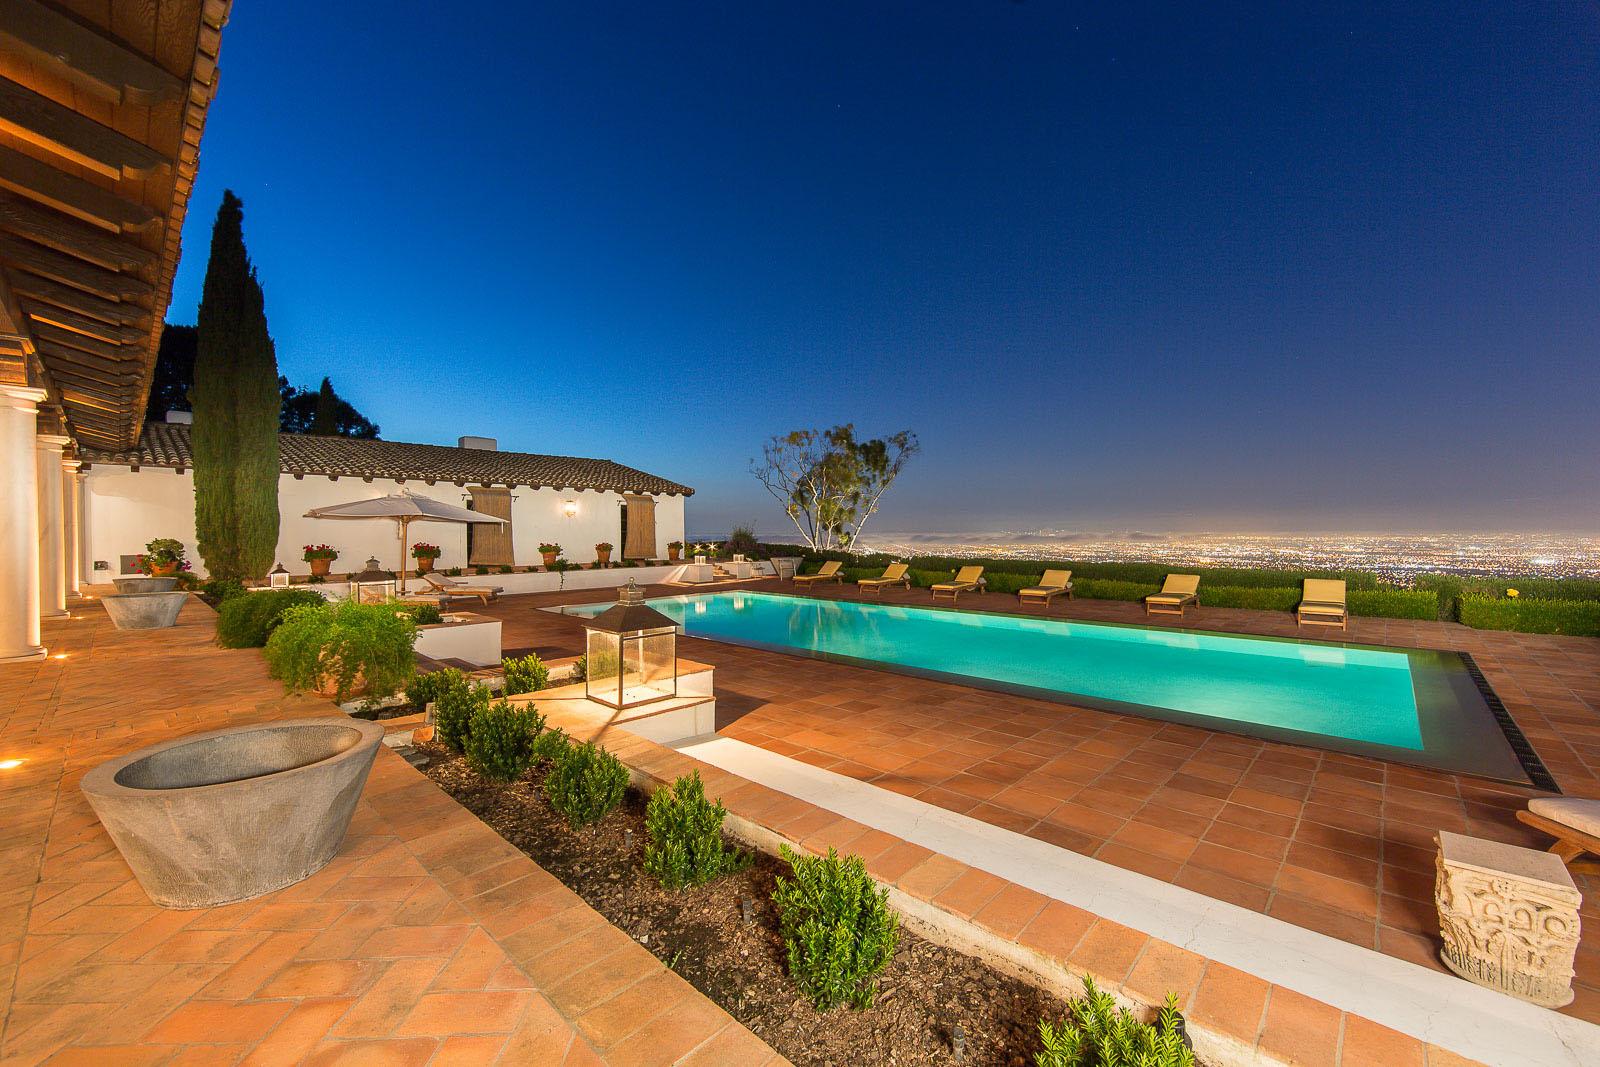 Hacienda De La Paz California 6